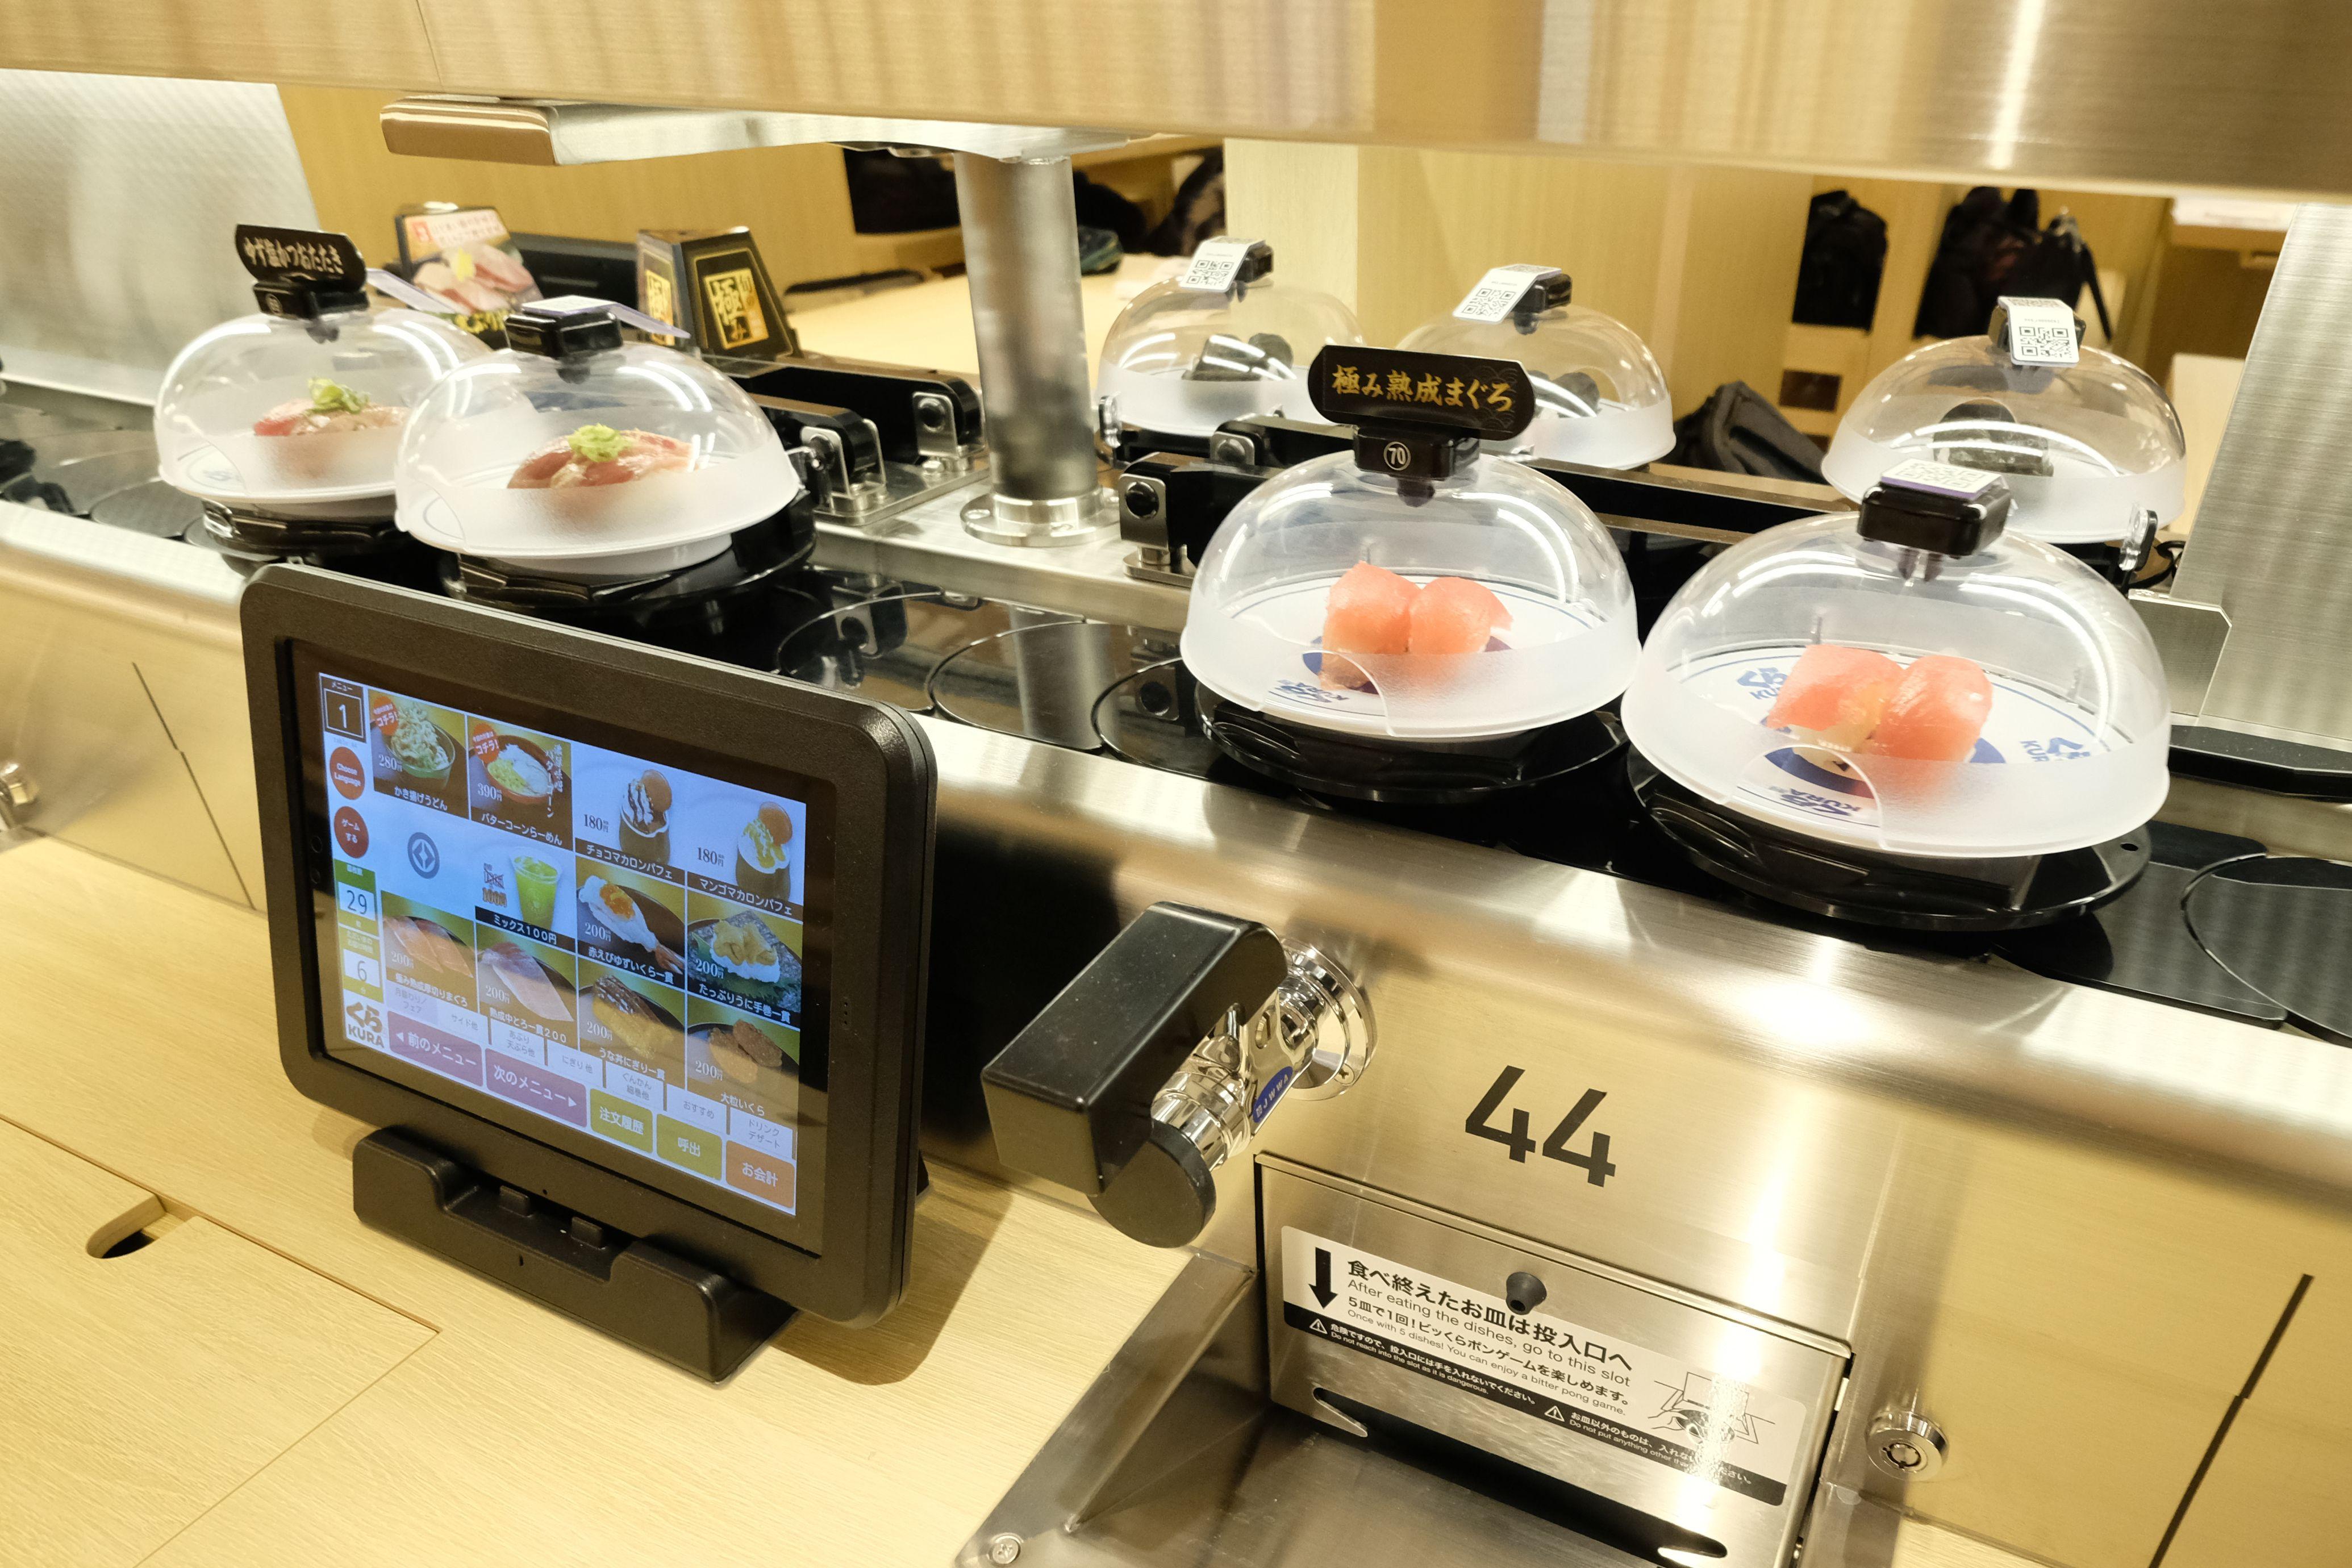 Conveyor belt sushi from Kura's flagship in Tokyo